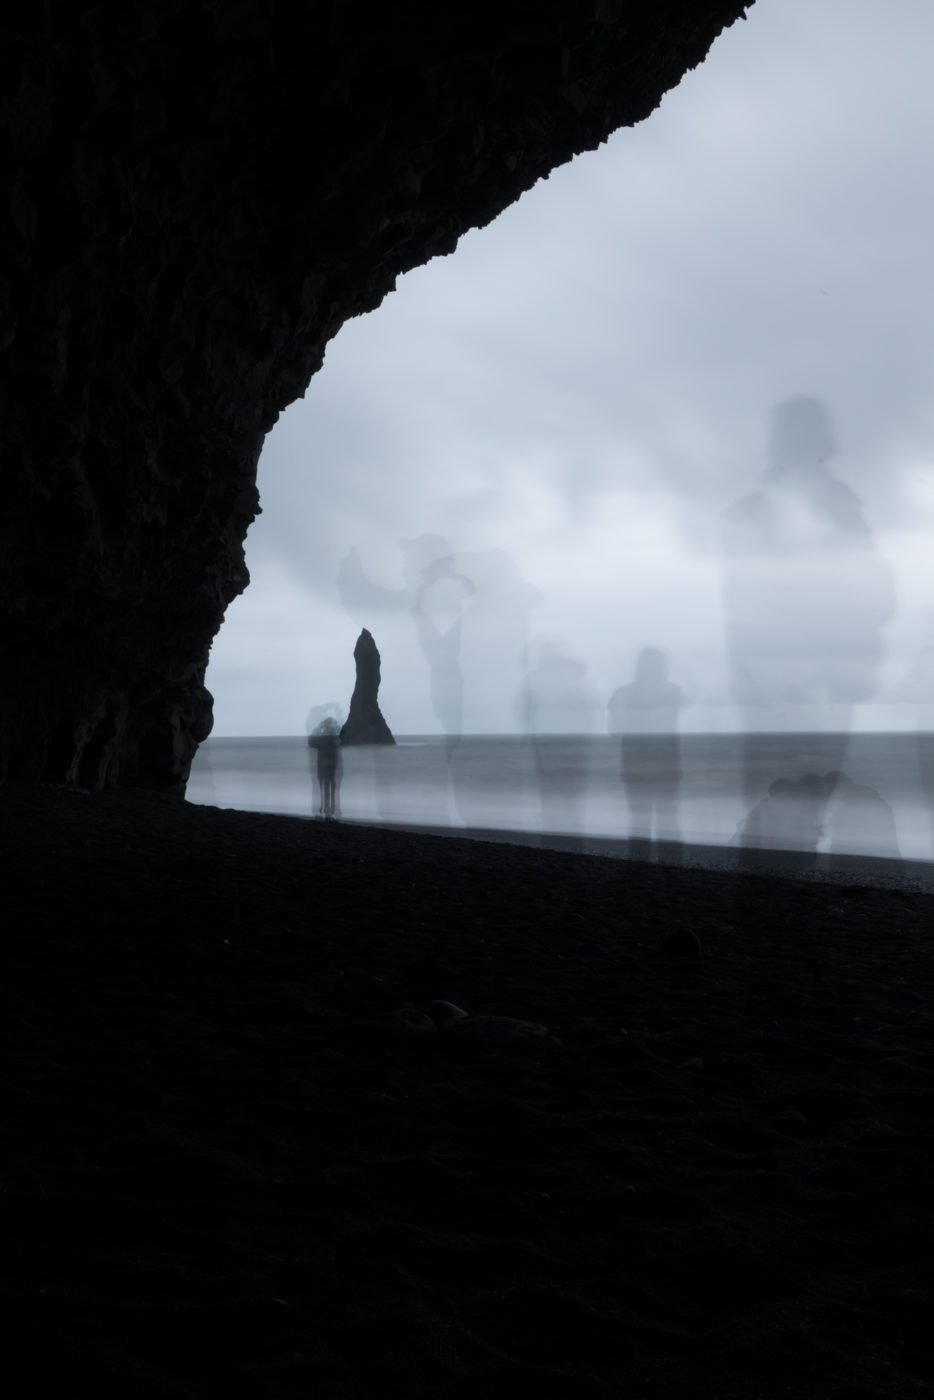 Reynisdrangar as seen from Vatnshellir cave